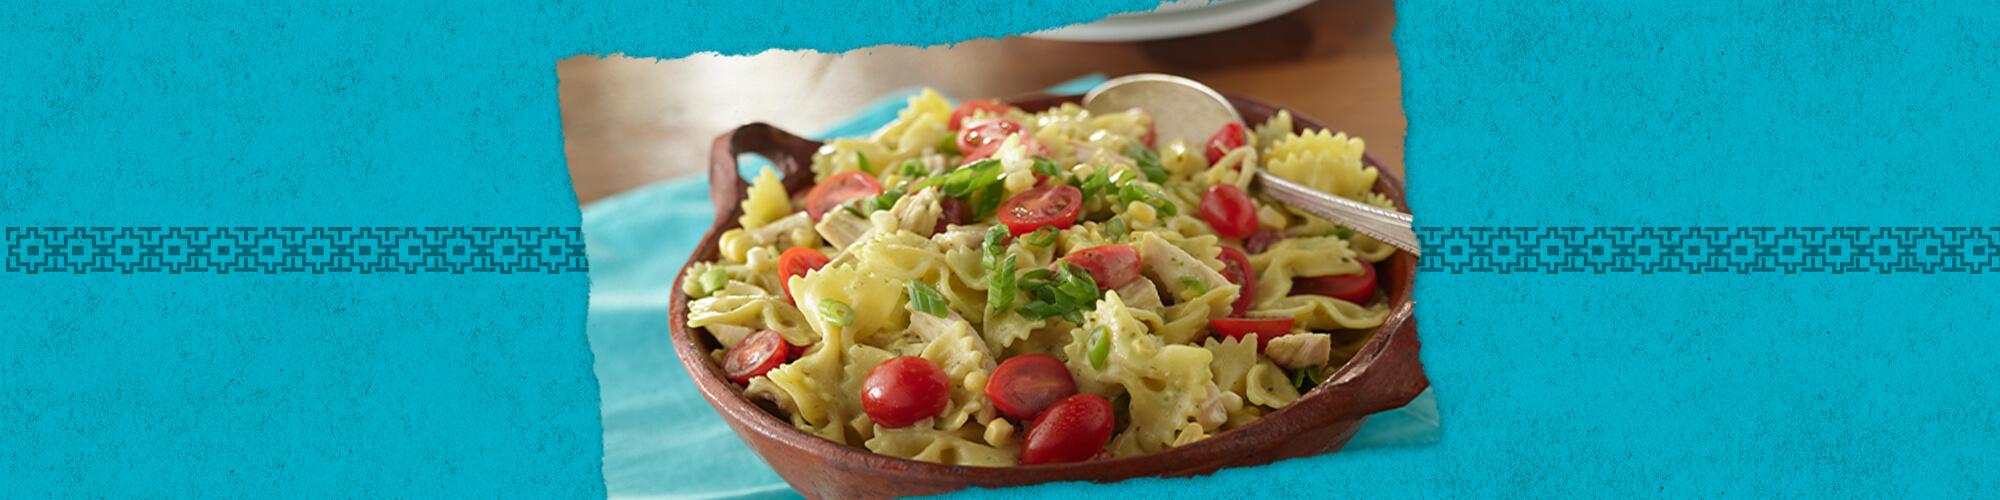 Salsas guacamole salsa pasta salad